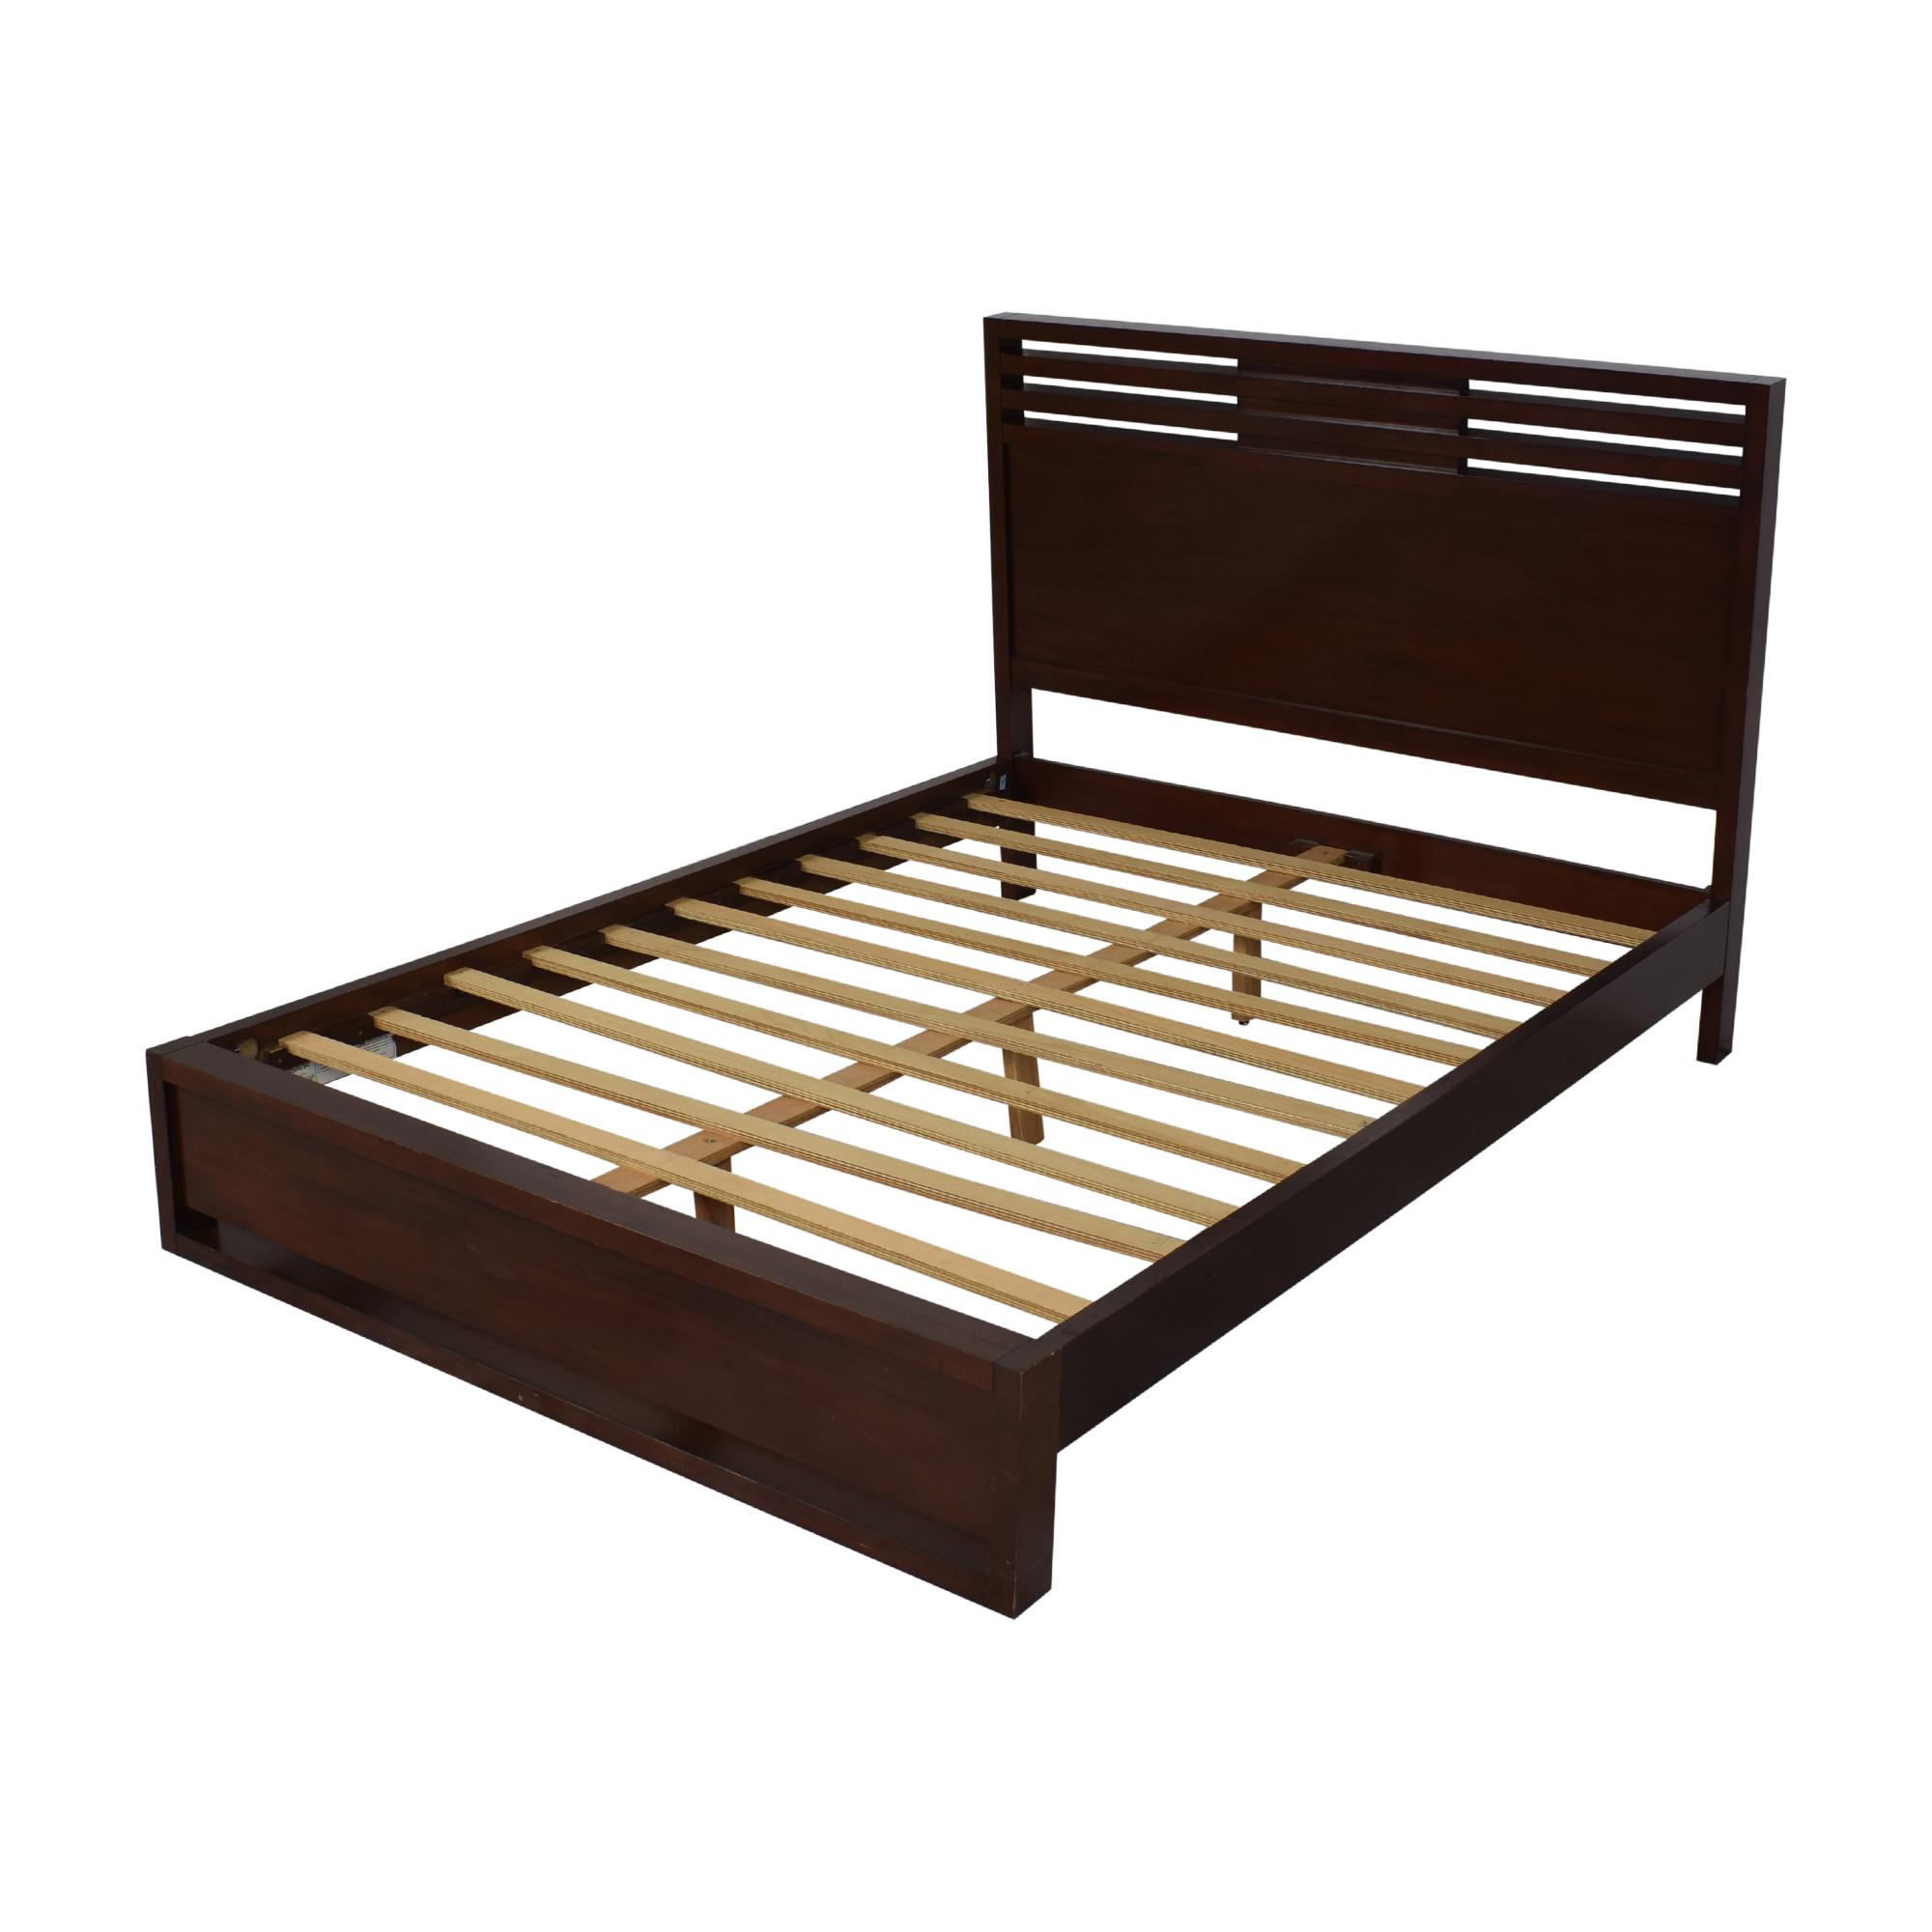 Casana Furniture Casana Queen Platform Bed Bed Frames